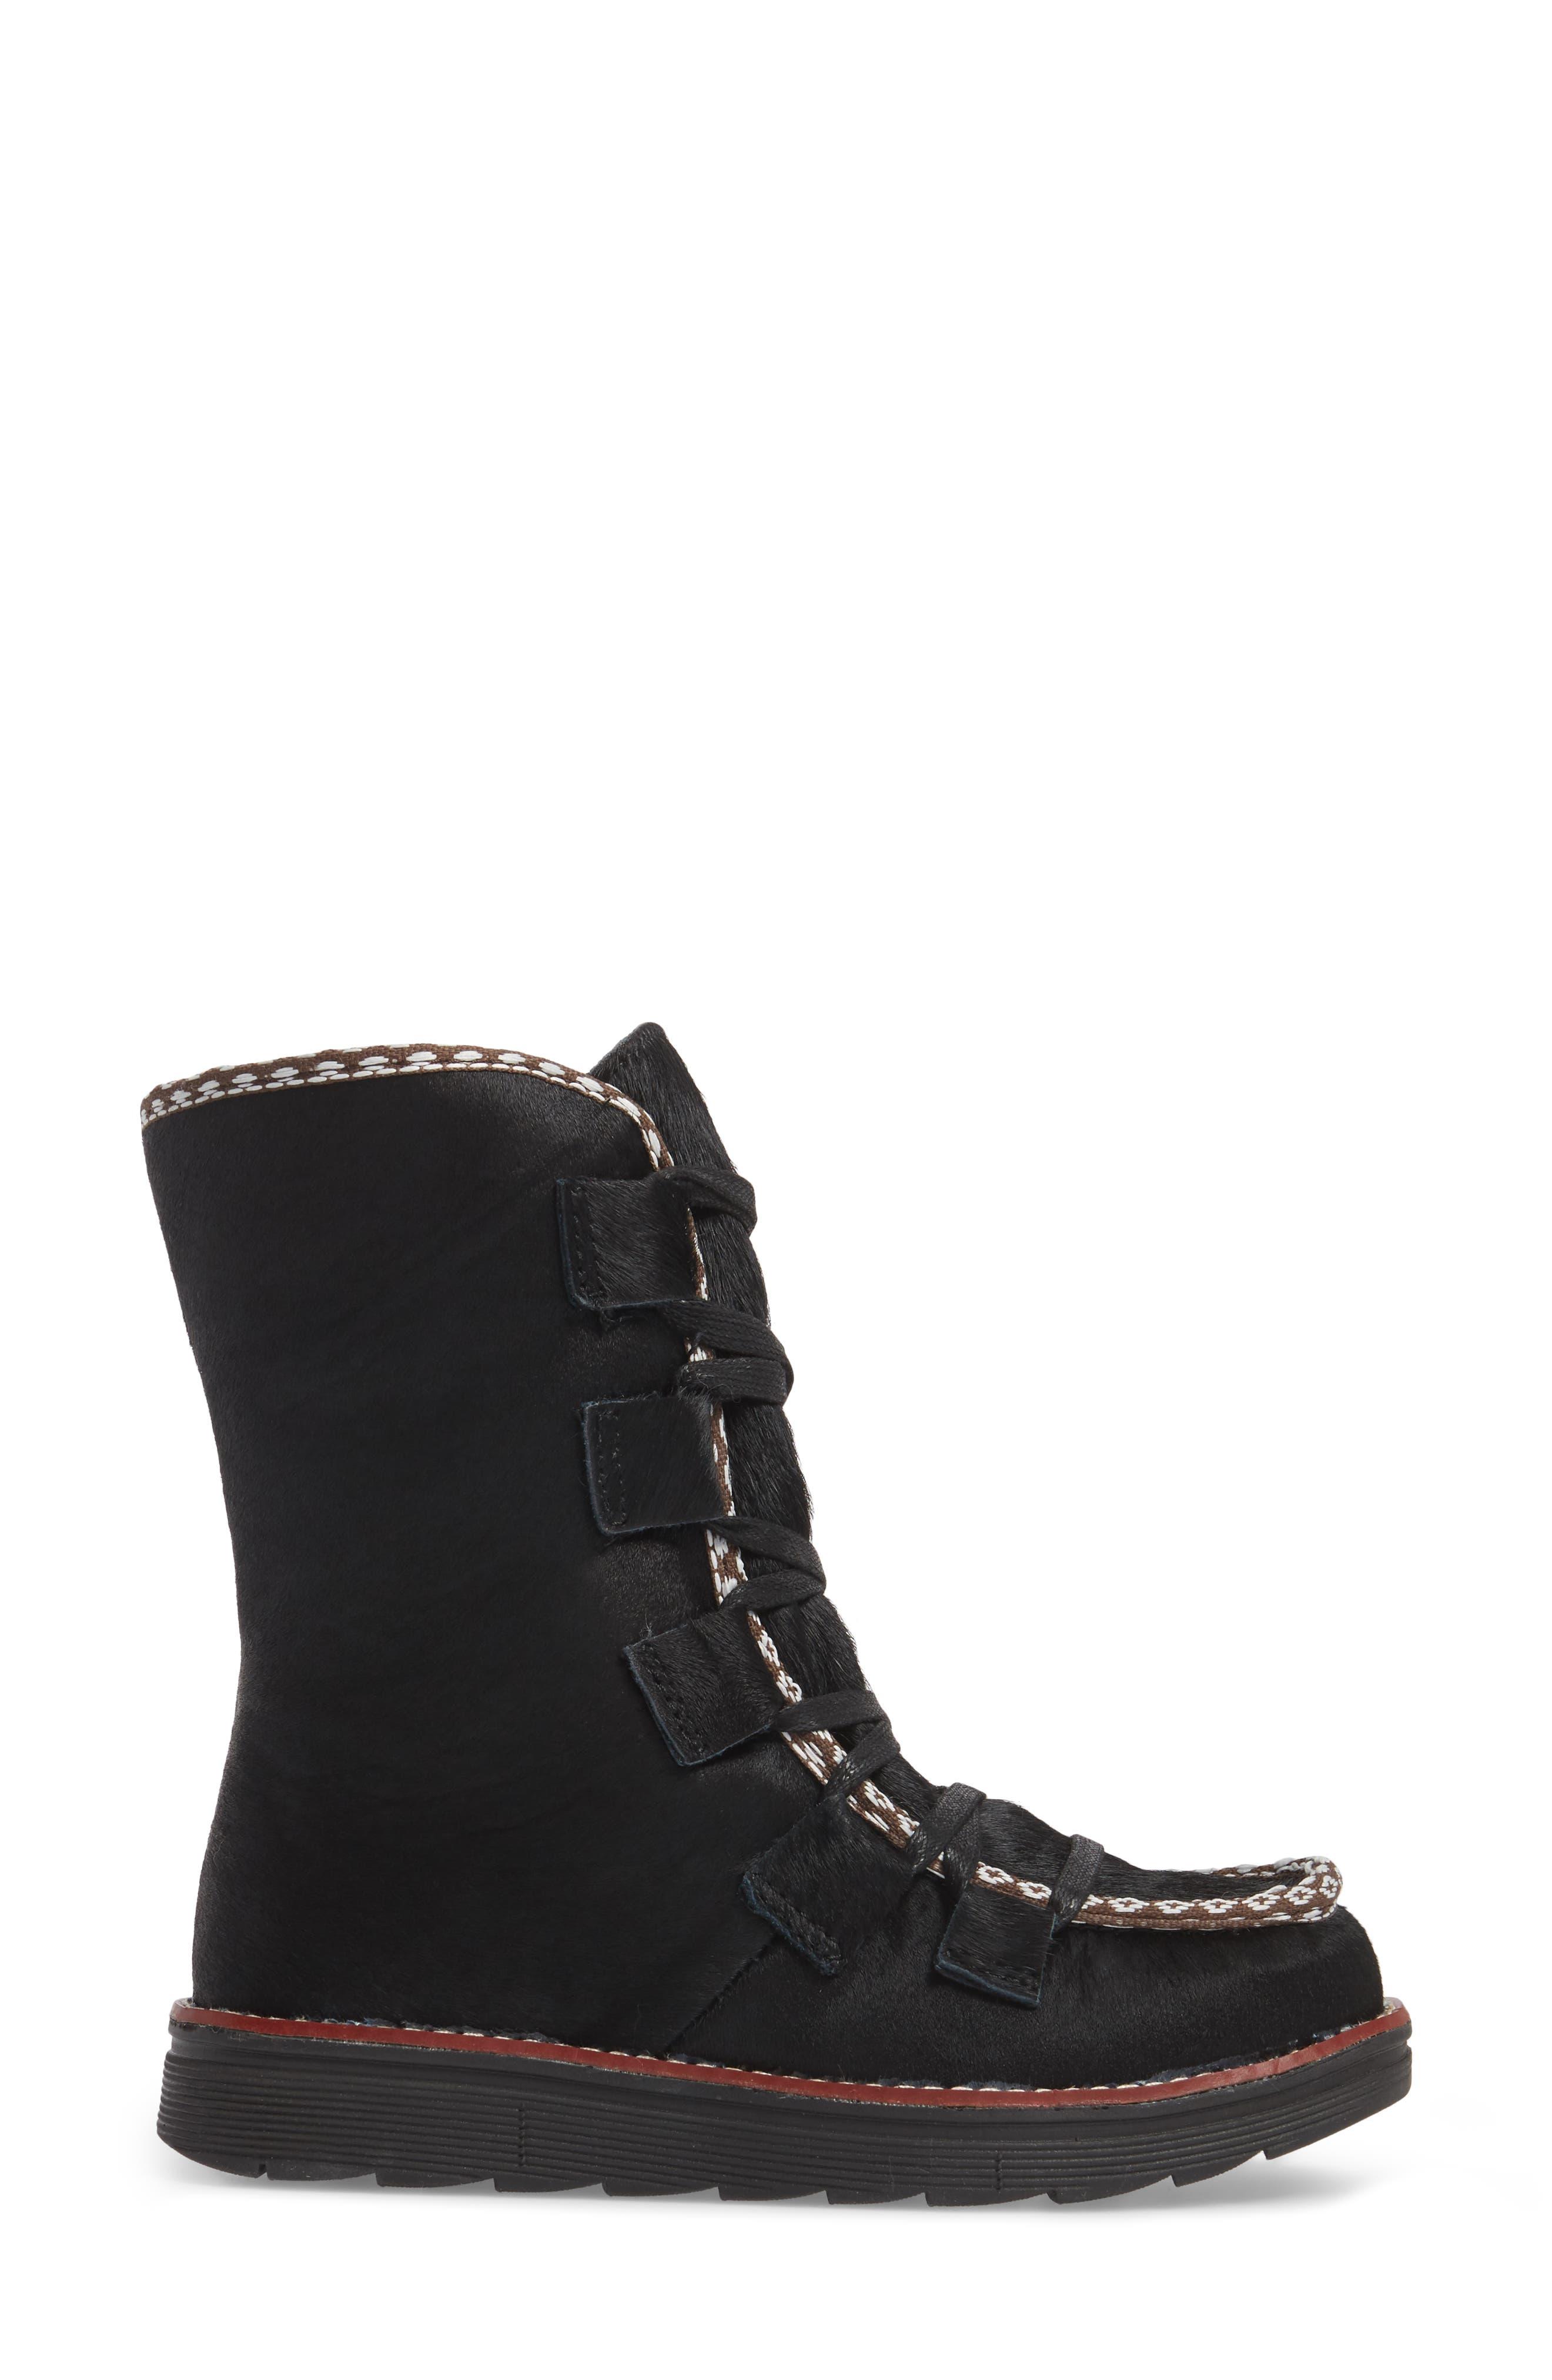 Kitchener Waterproof Genuine Calf Hair Snow Boot,                             Alternate thumbnail 3, color,                             Black